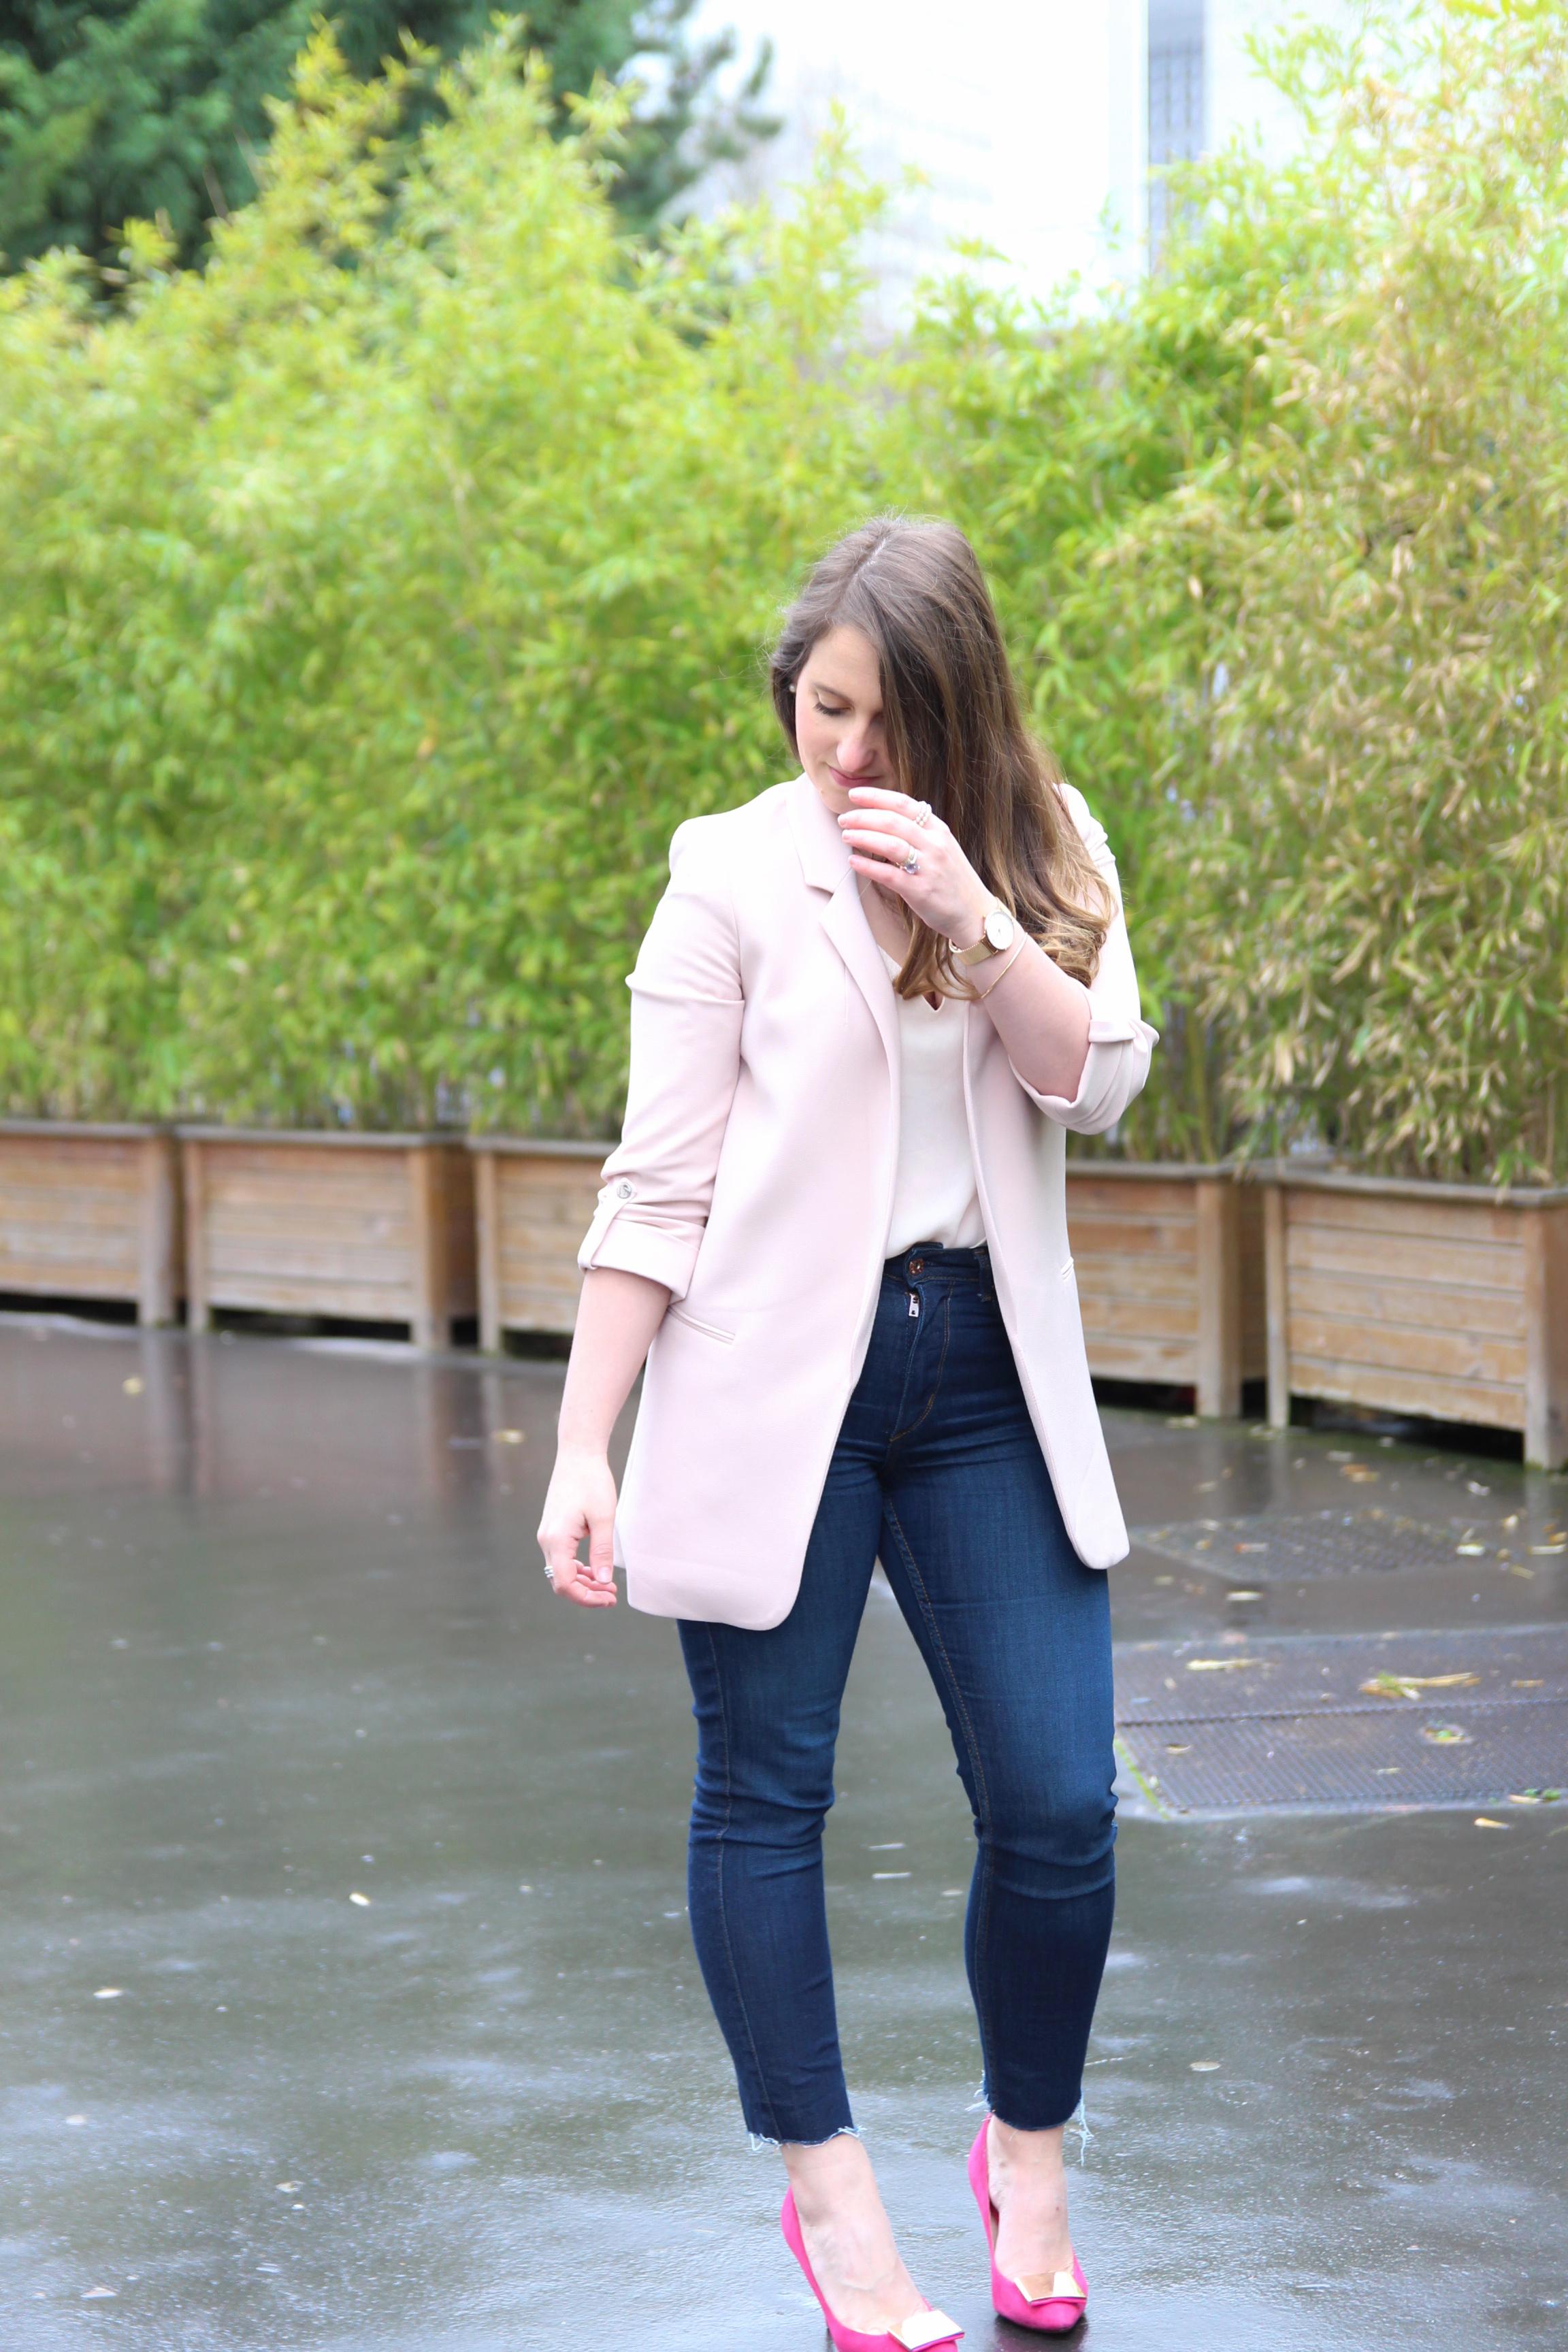 fashionblogger-influencer-jacket-zara-rosepastel-paris-seralynepointcom-2017-03-21 115645